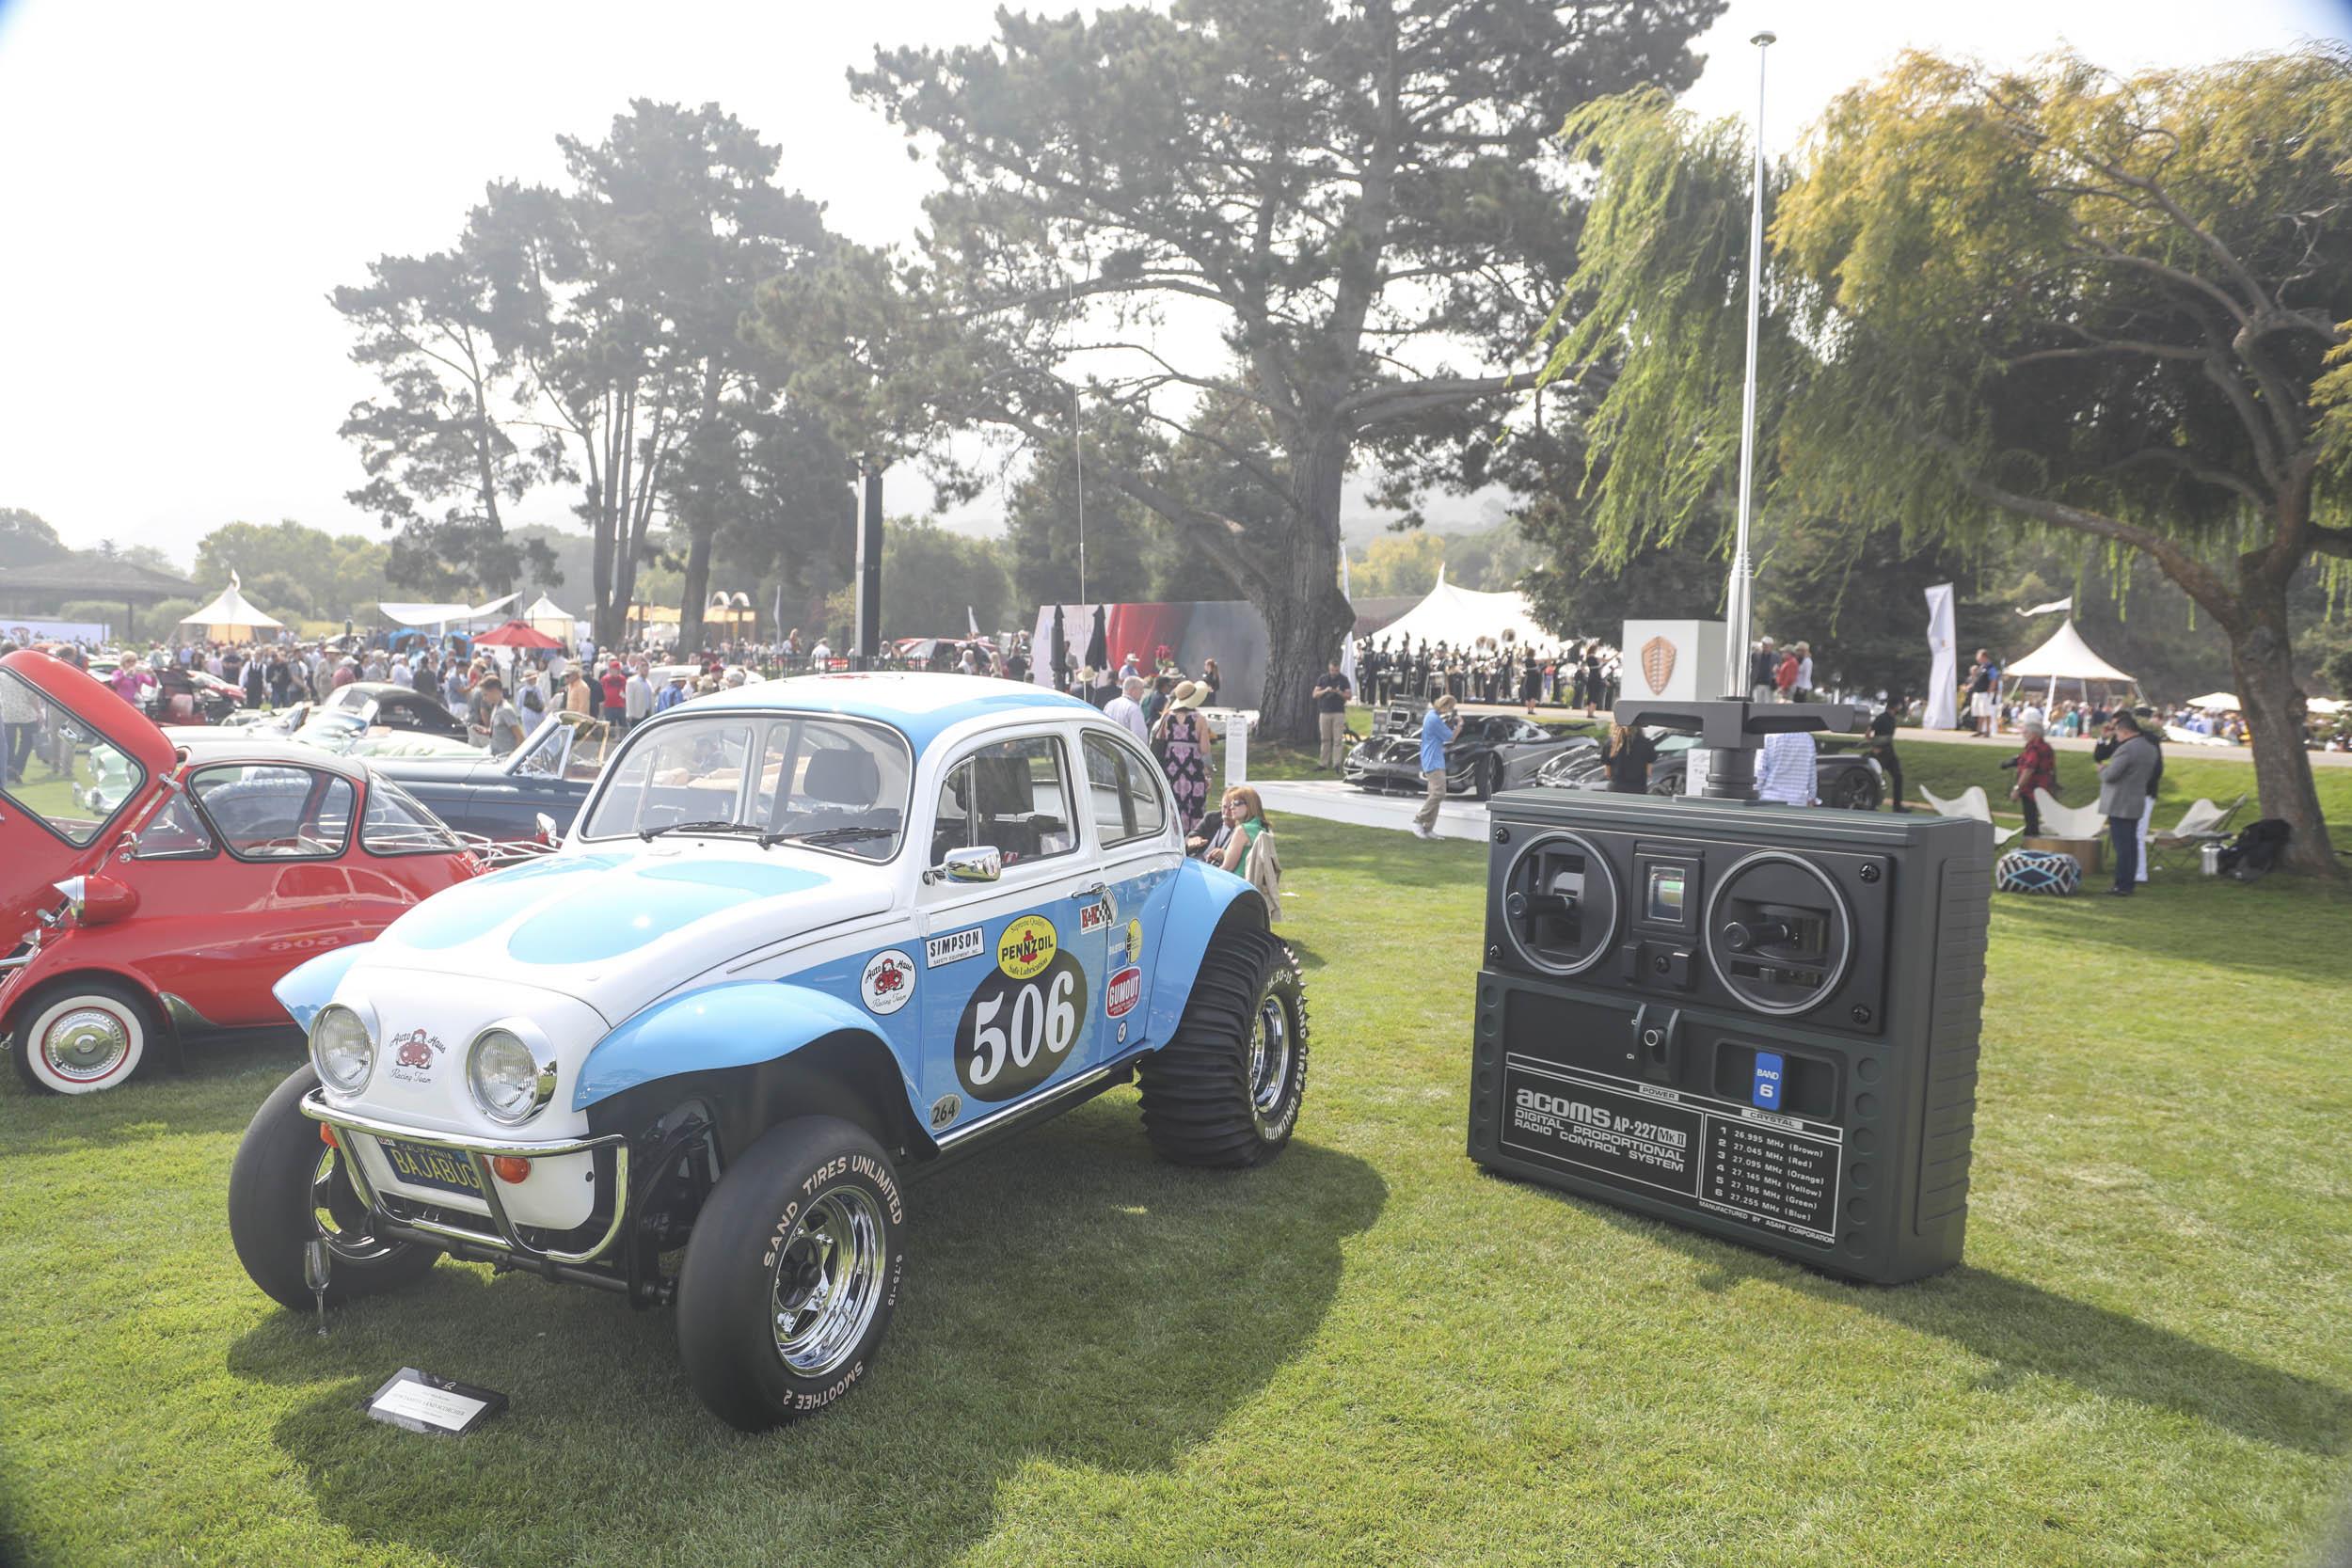 custom VW Beetle RC car